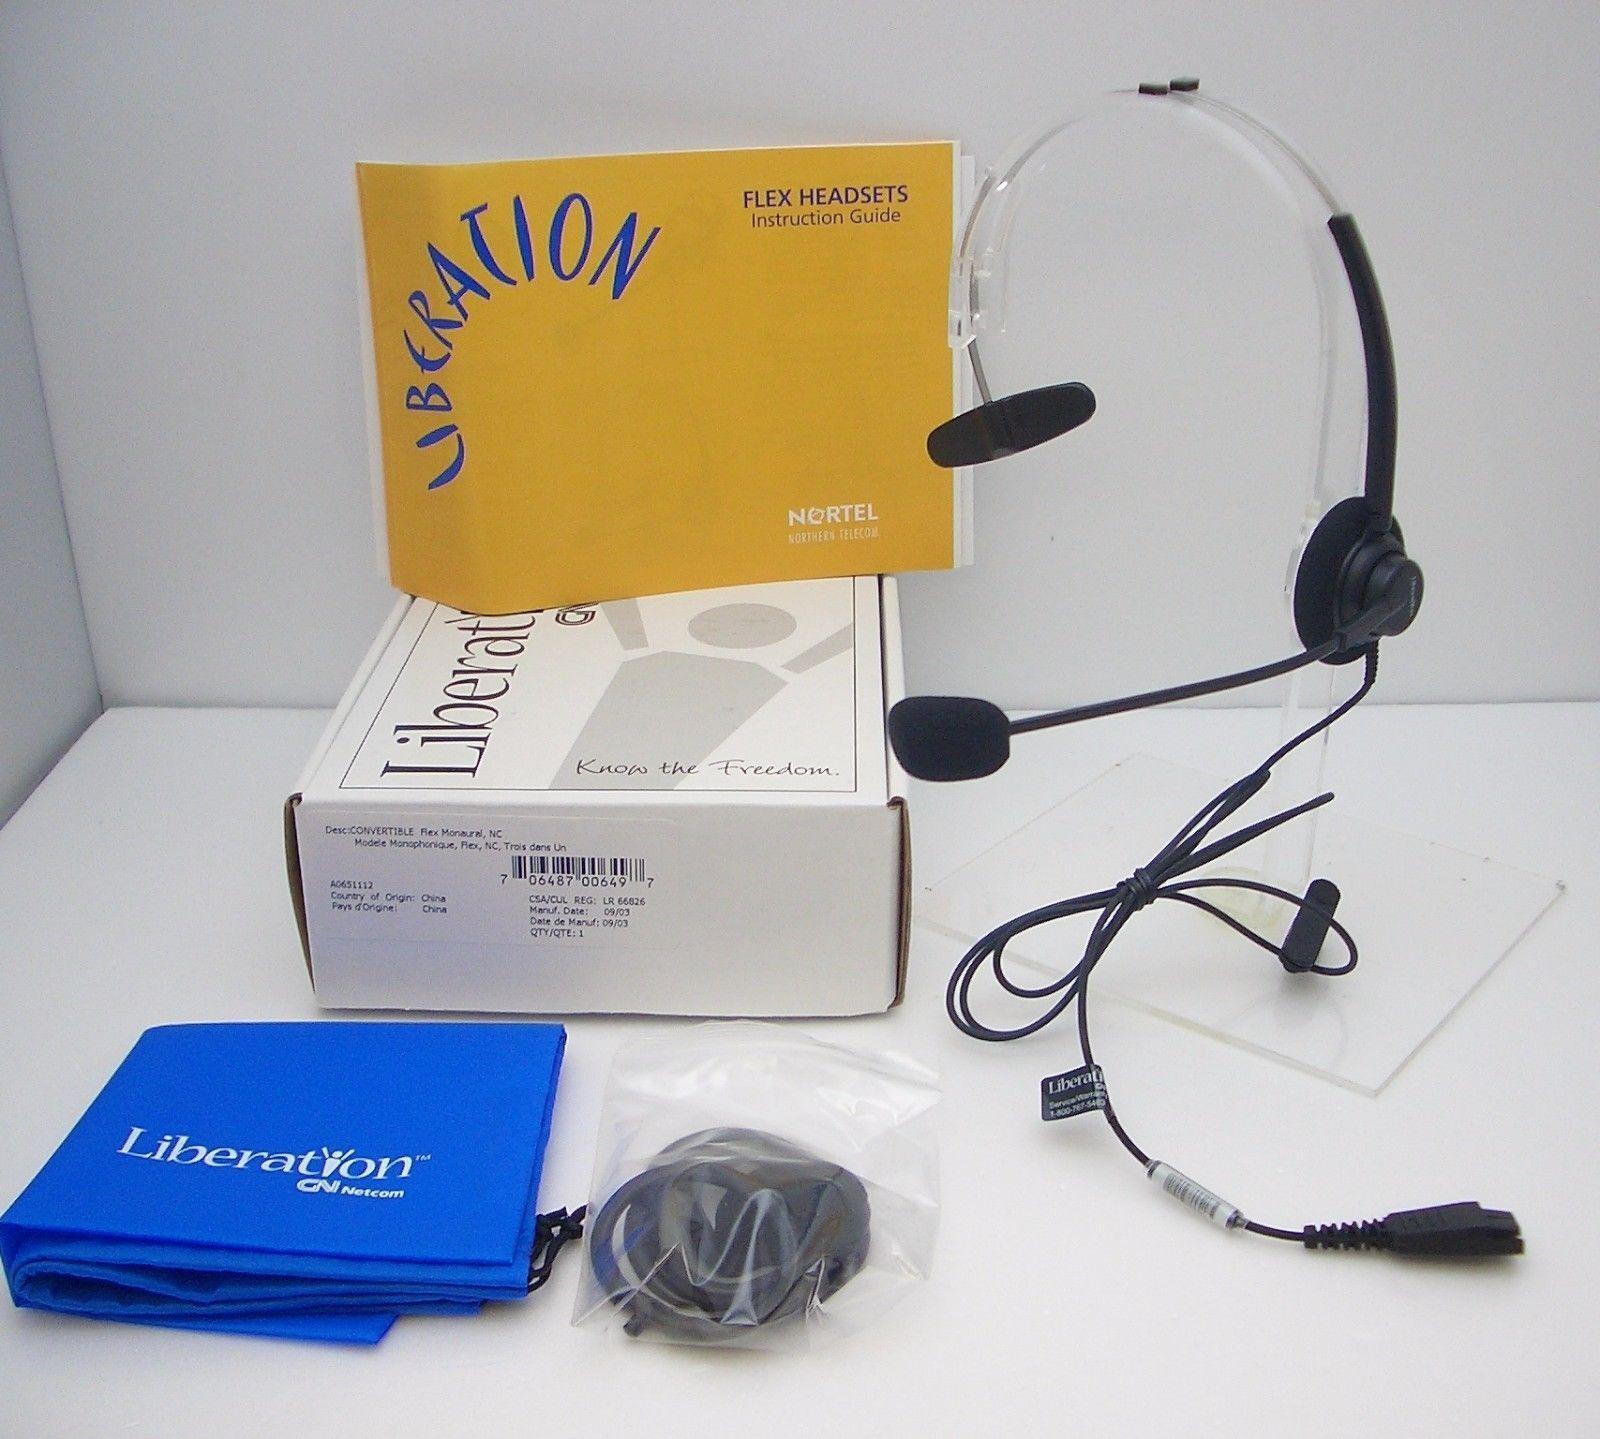 ... Netcom GN 405-Flex Monaural. SureFit Convertible NC headset. It  requires Jabra Link 850 Amplifier which is not included